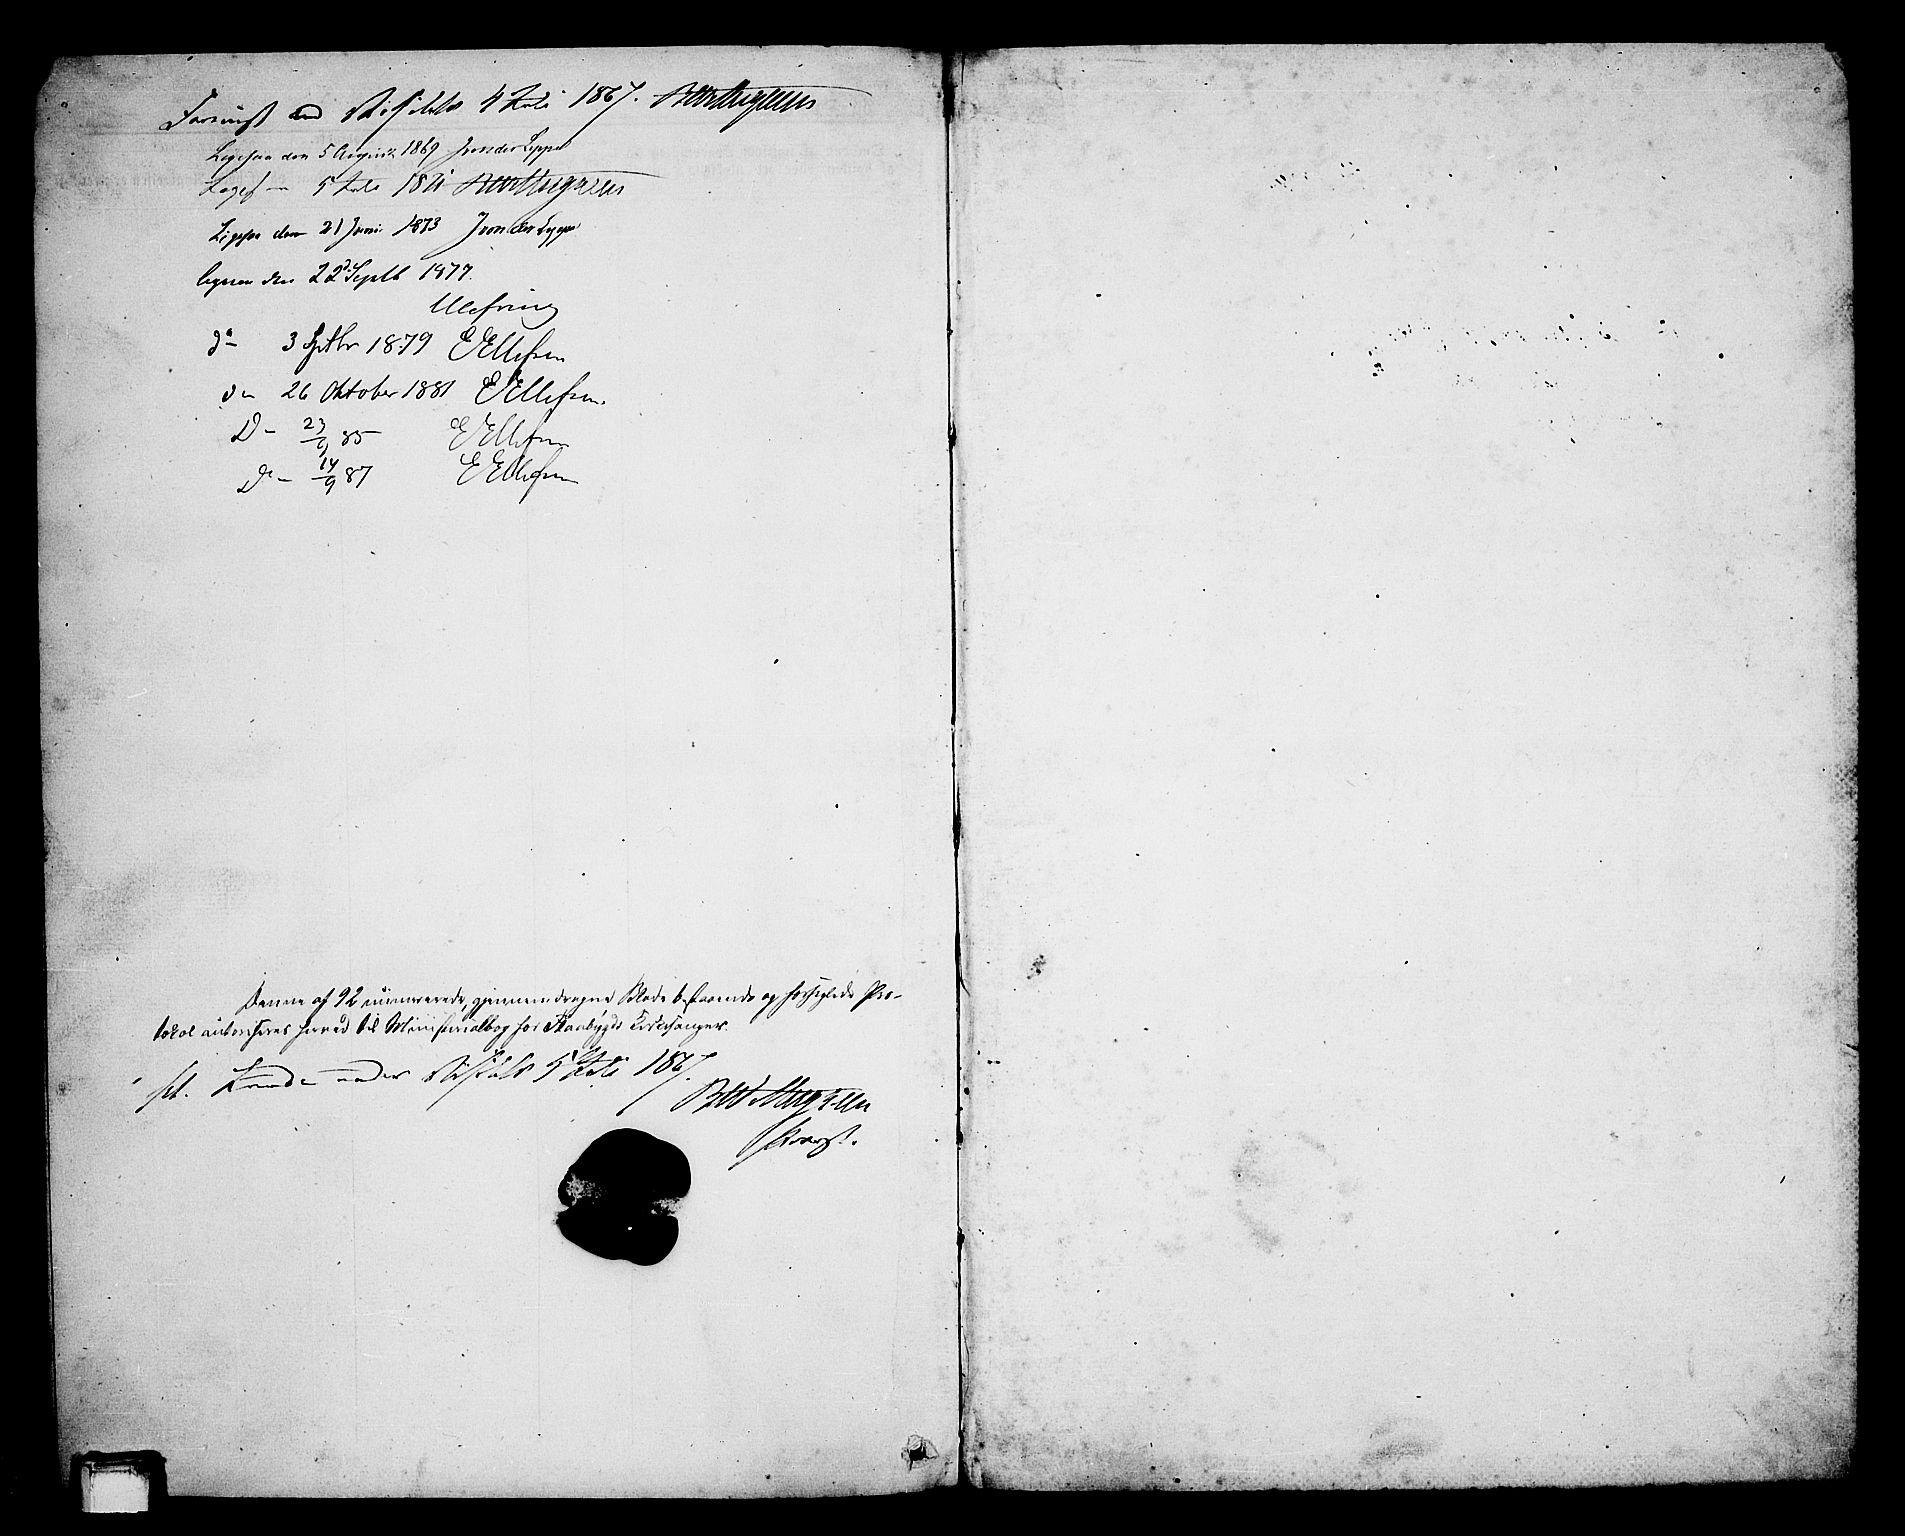 SAKO, Lunde kirkebøker, G/Gb/L0001: Klokkerbok nr. II 1, 1866-1887